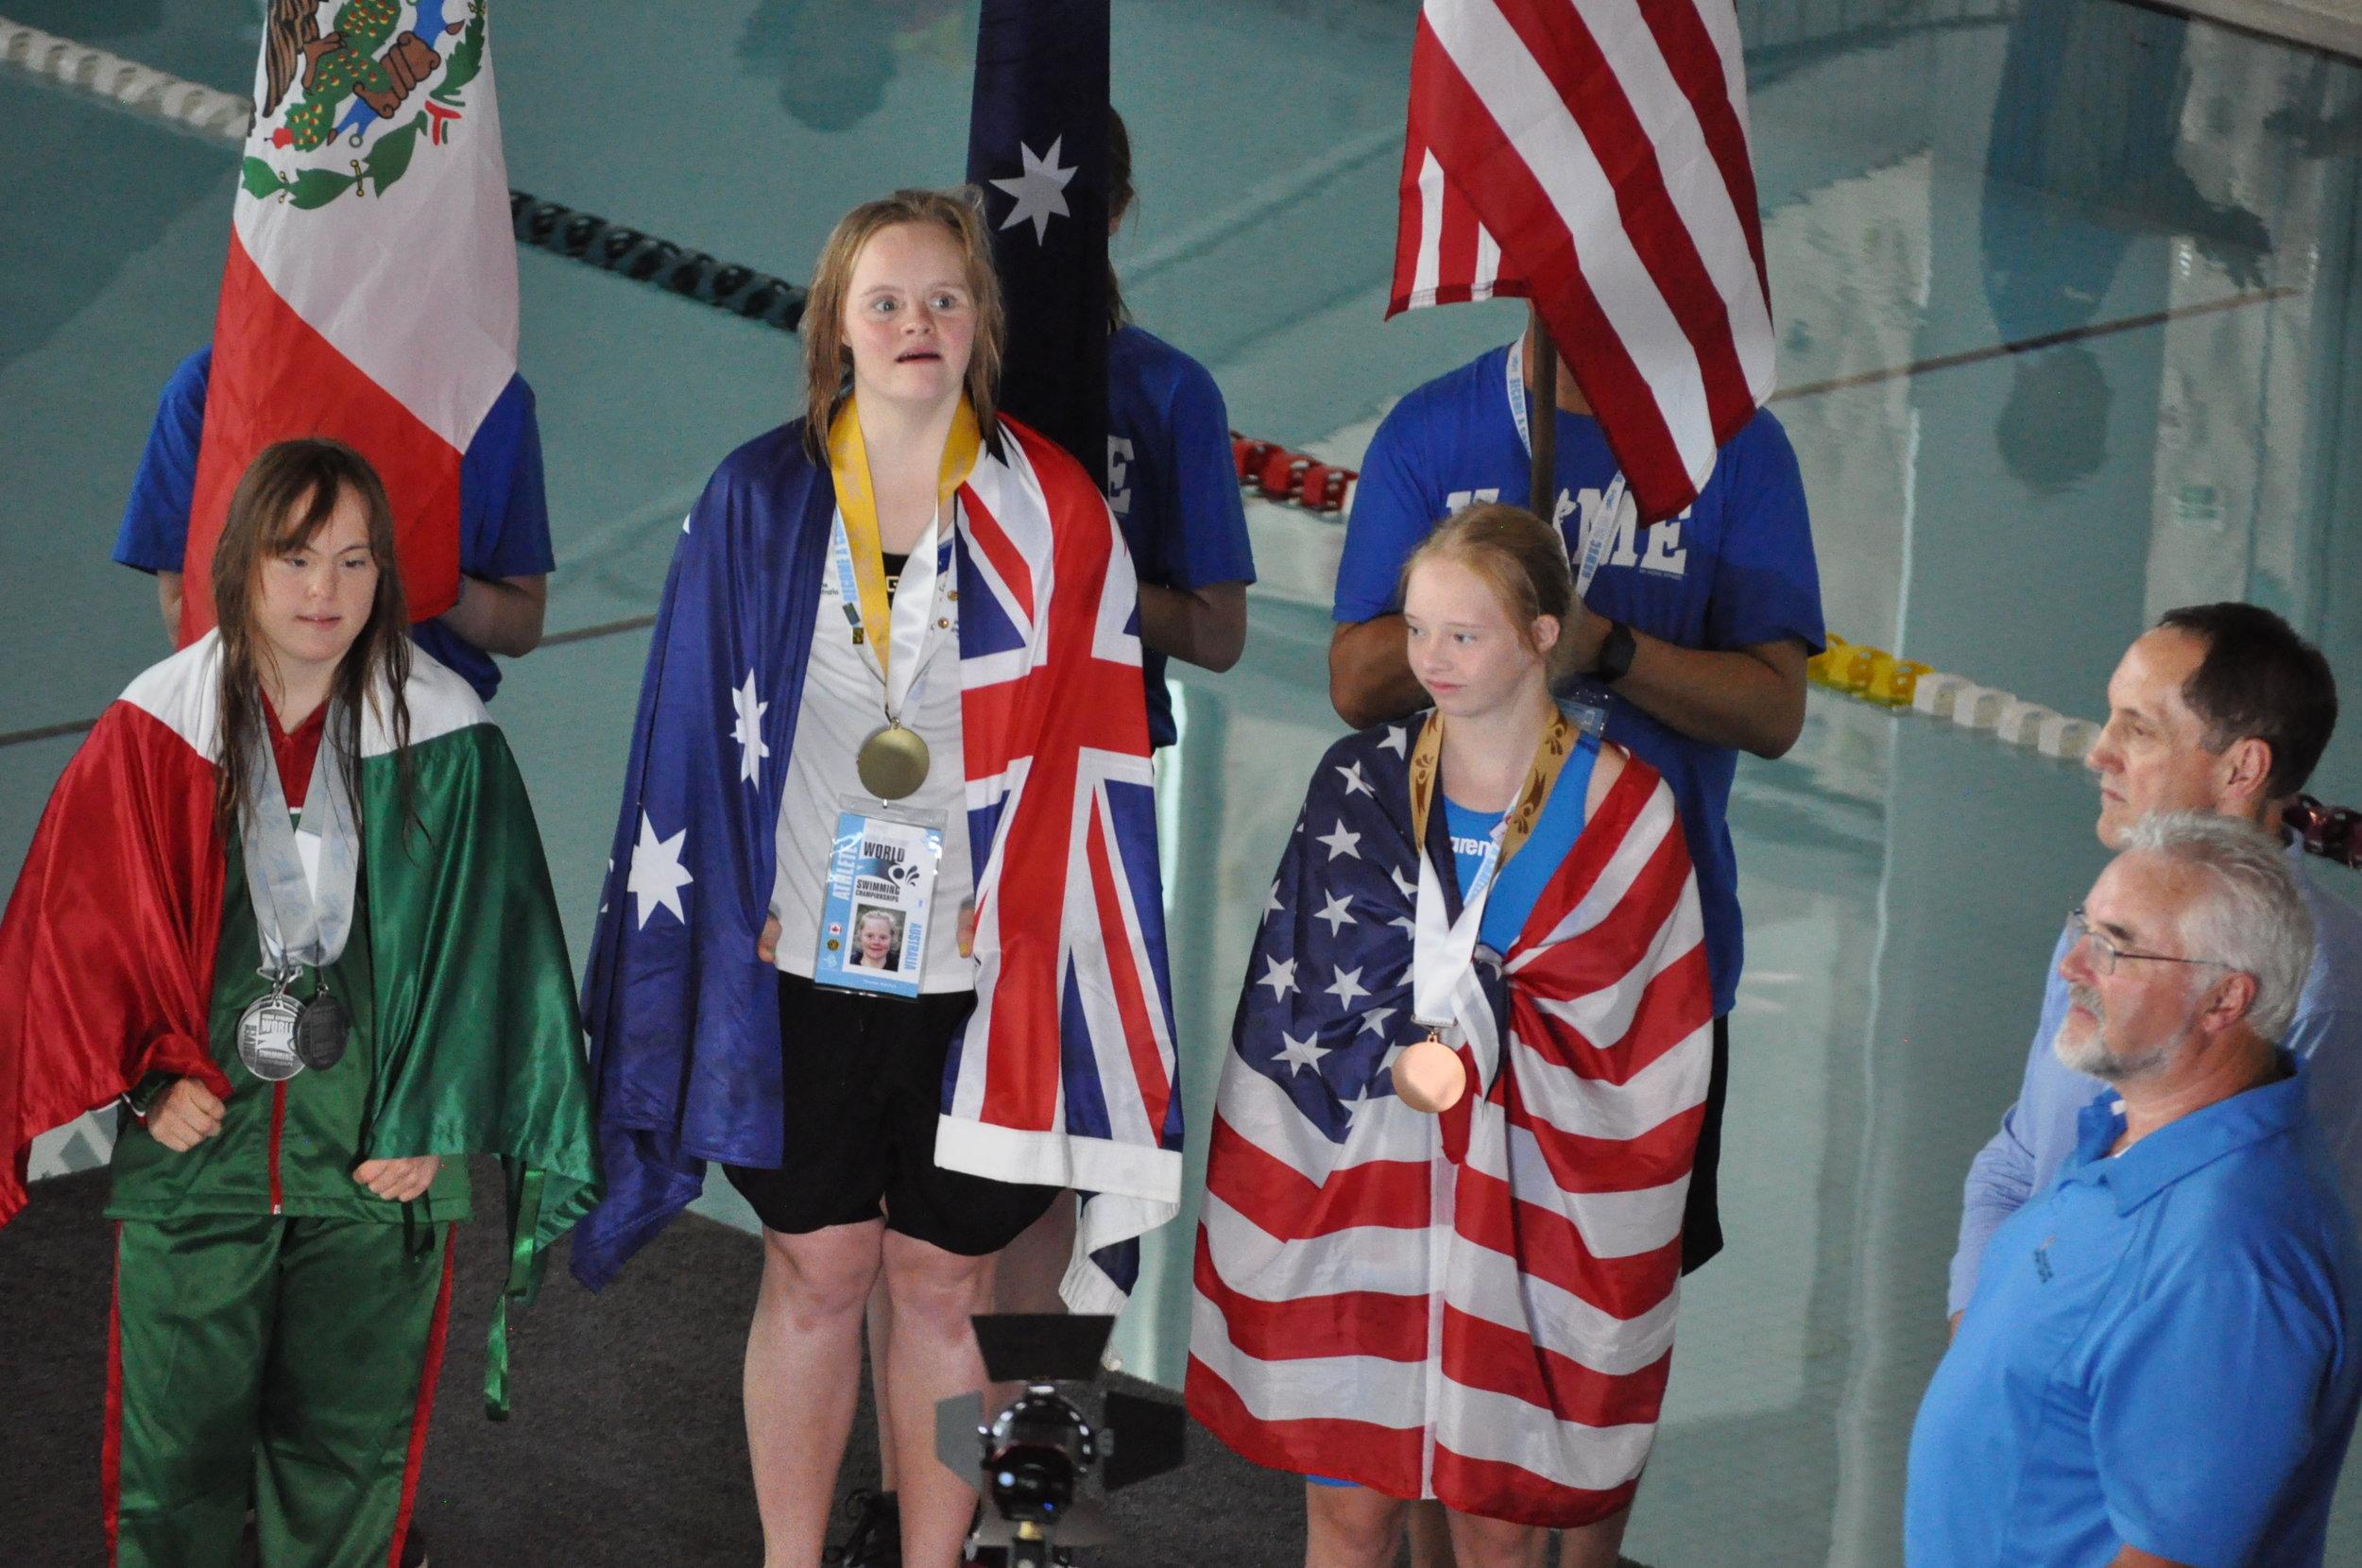 Maggie Scherder - Peoria, ILBRONZE - Women's 100 Back2018 DSISO World Swim Championships - Nova Scotia, Canada